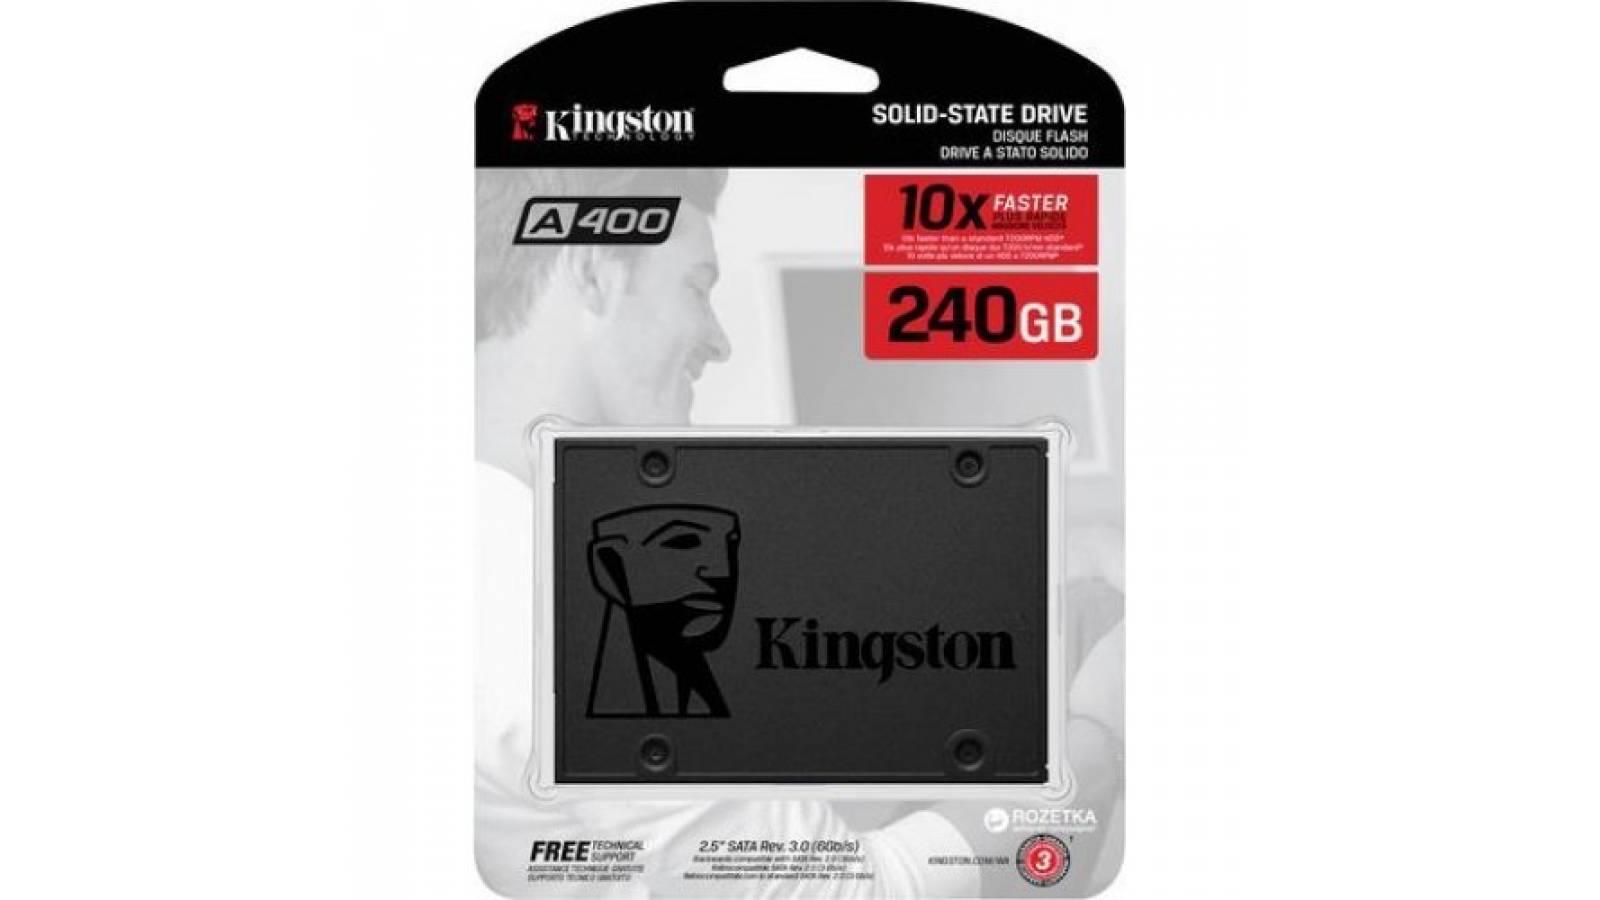 DISCO SOLIDO KINGSTON 240 GB SSDNOW A400 -SA400S37/240G